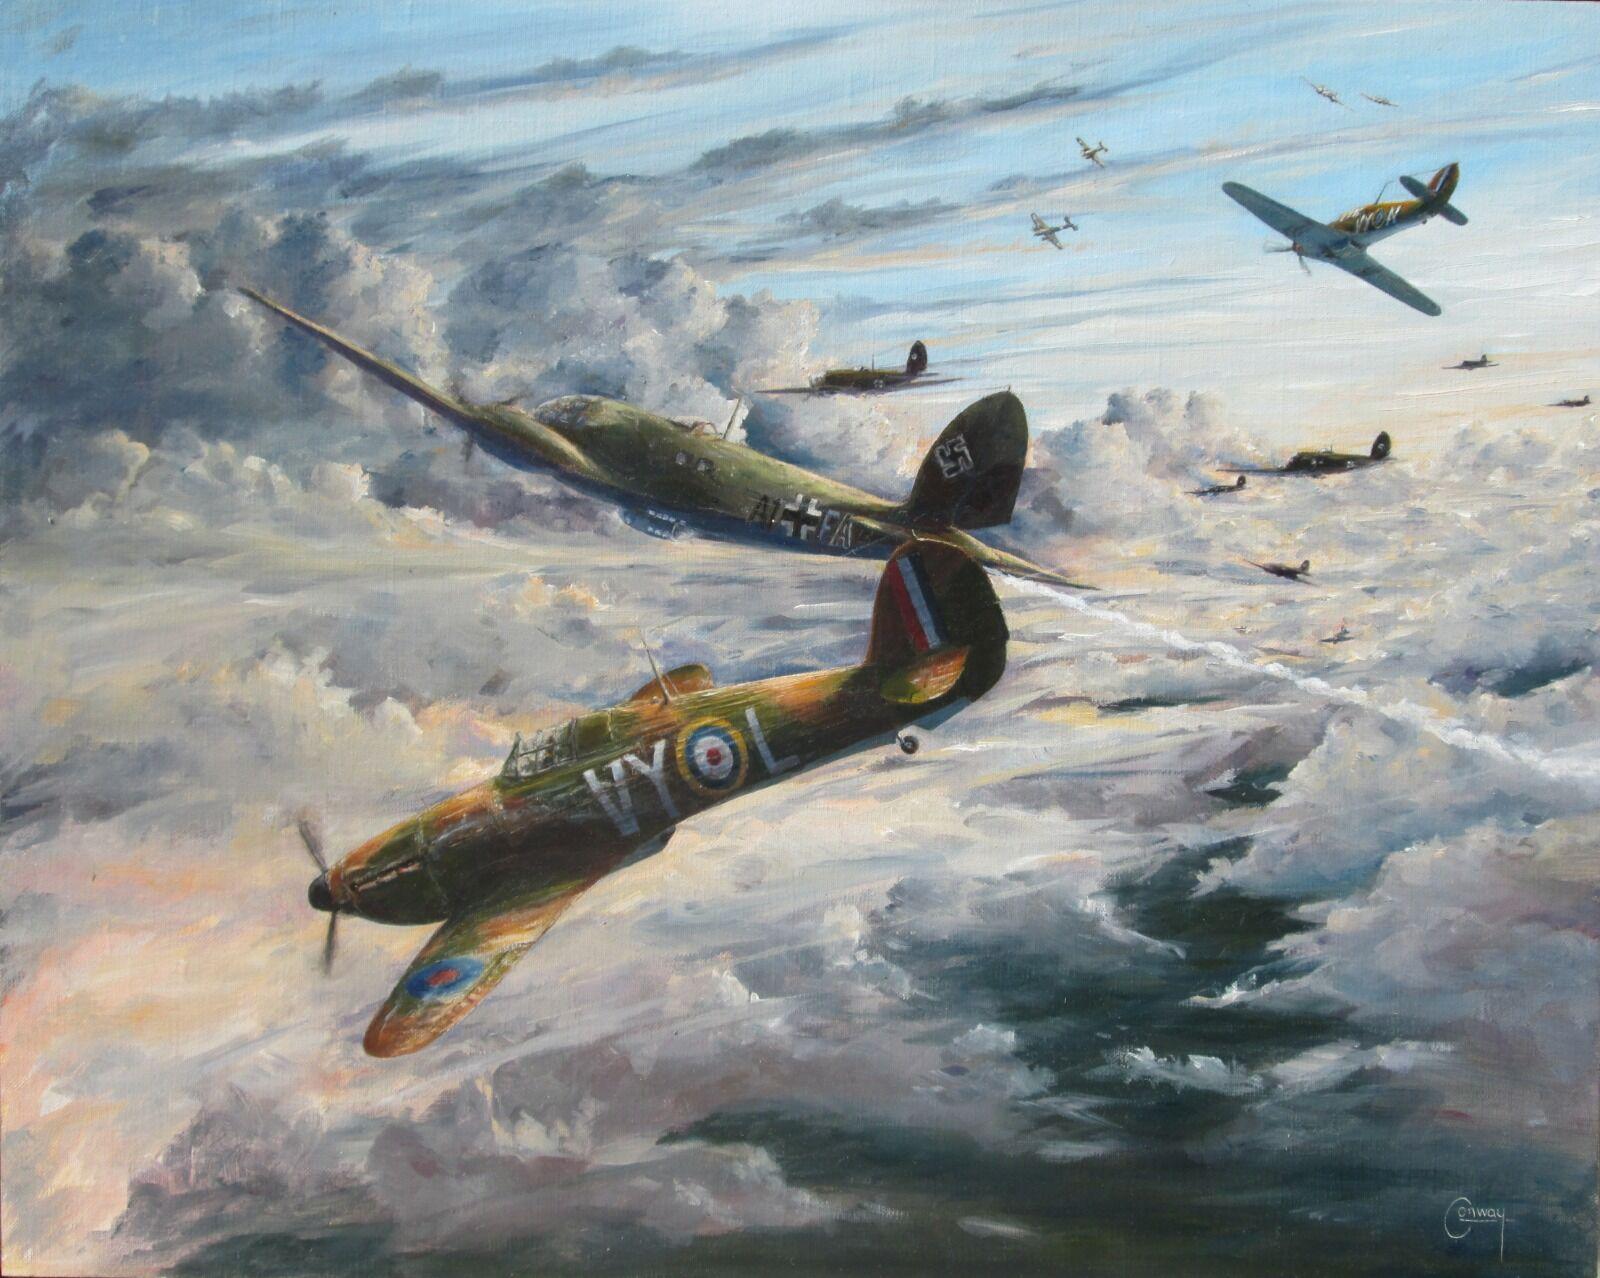 'Evening Fight' - Hurricane of F/Lt. Harry Raymond Hamilton, No. 85 Squadron